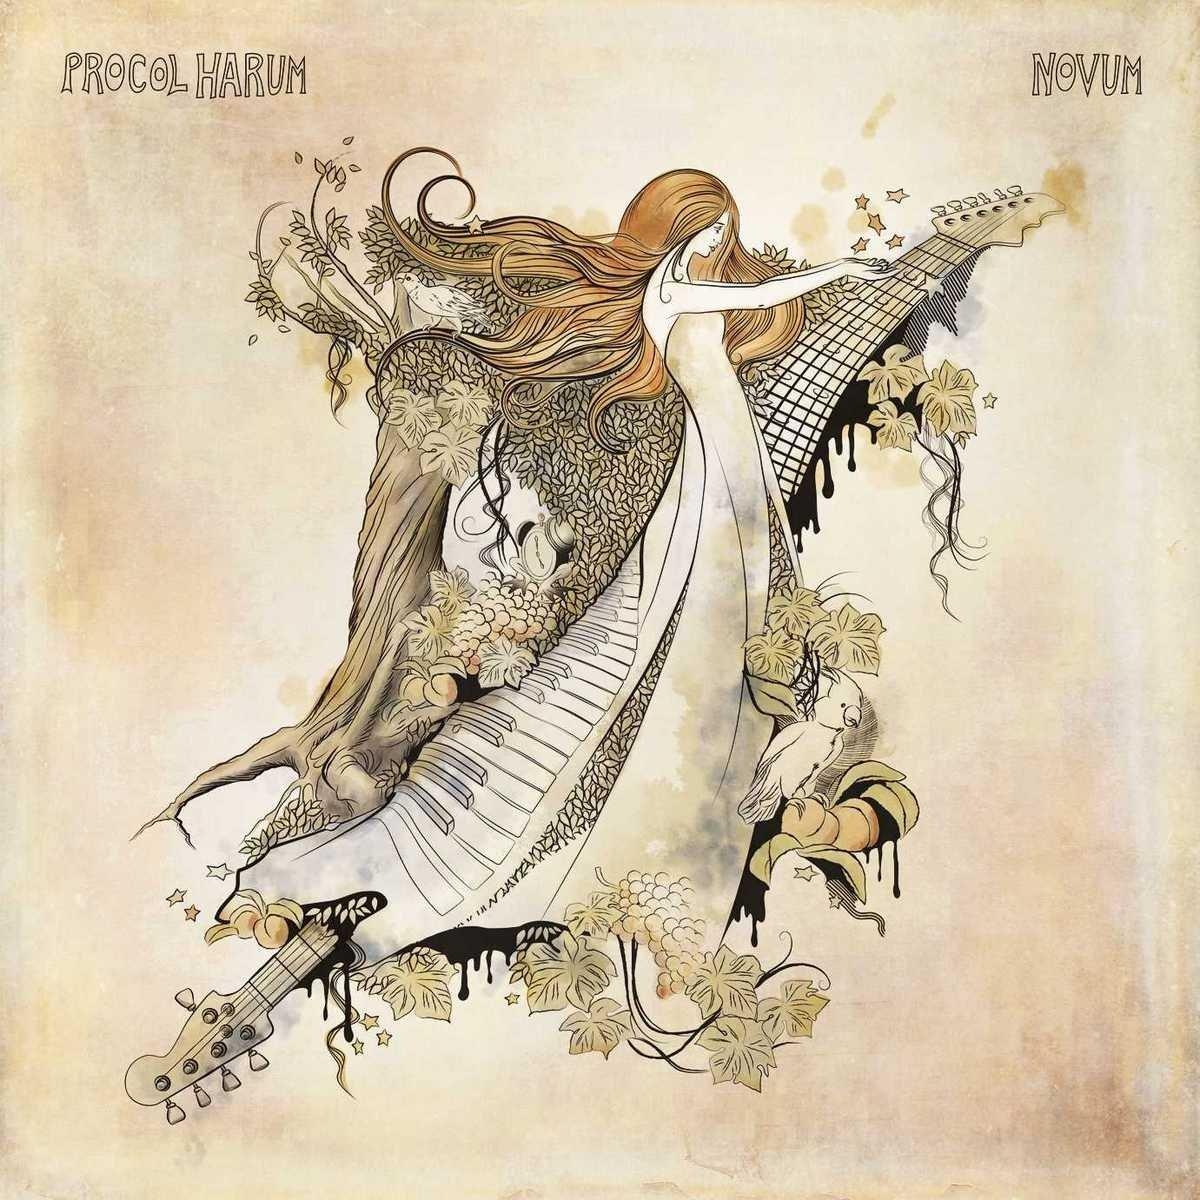 Novum - Vinyl Set by Procol Harum image